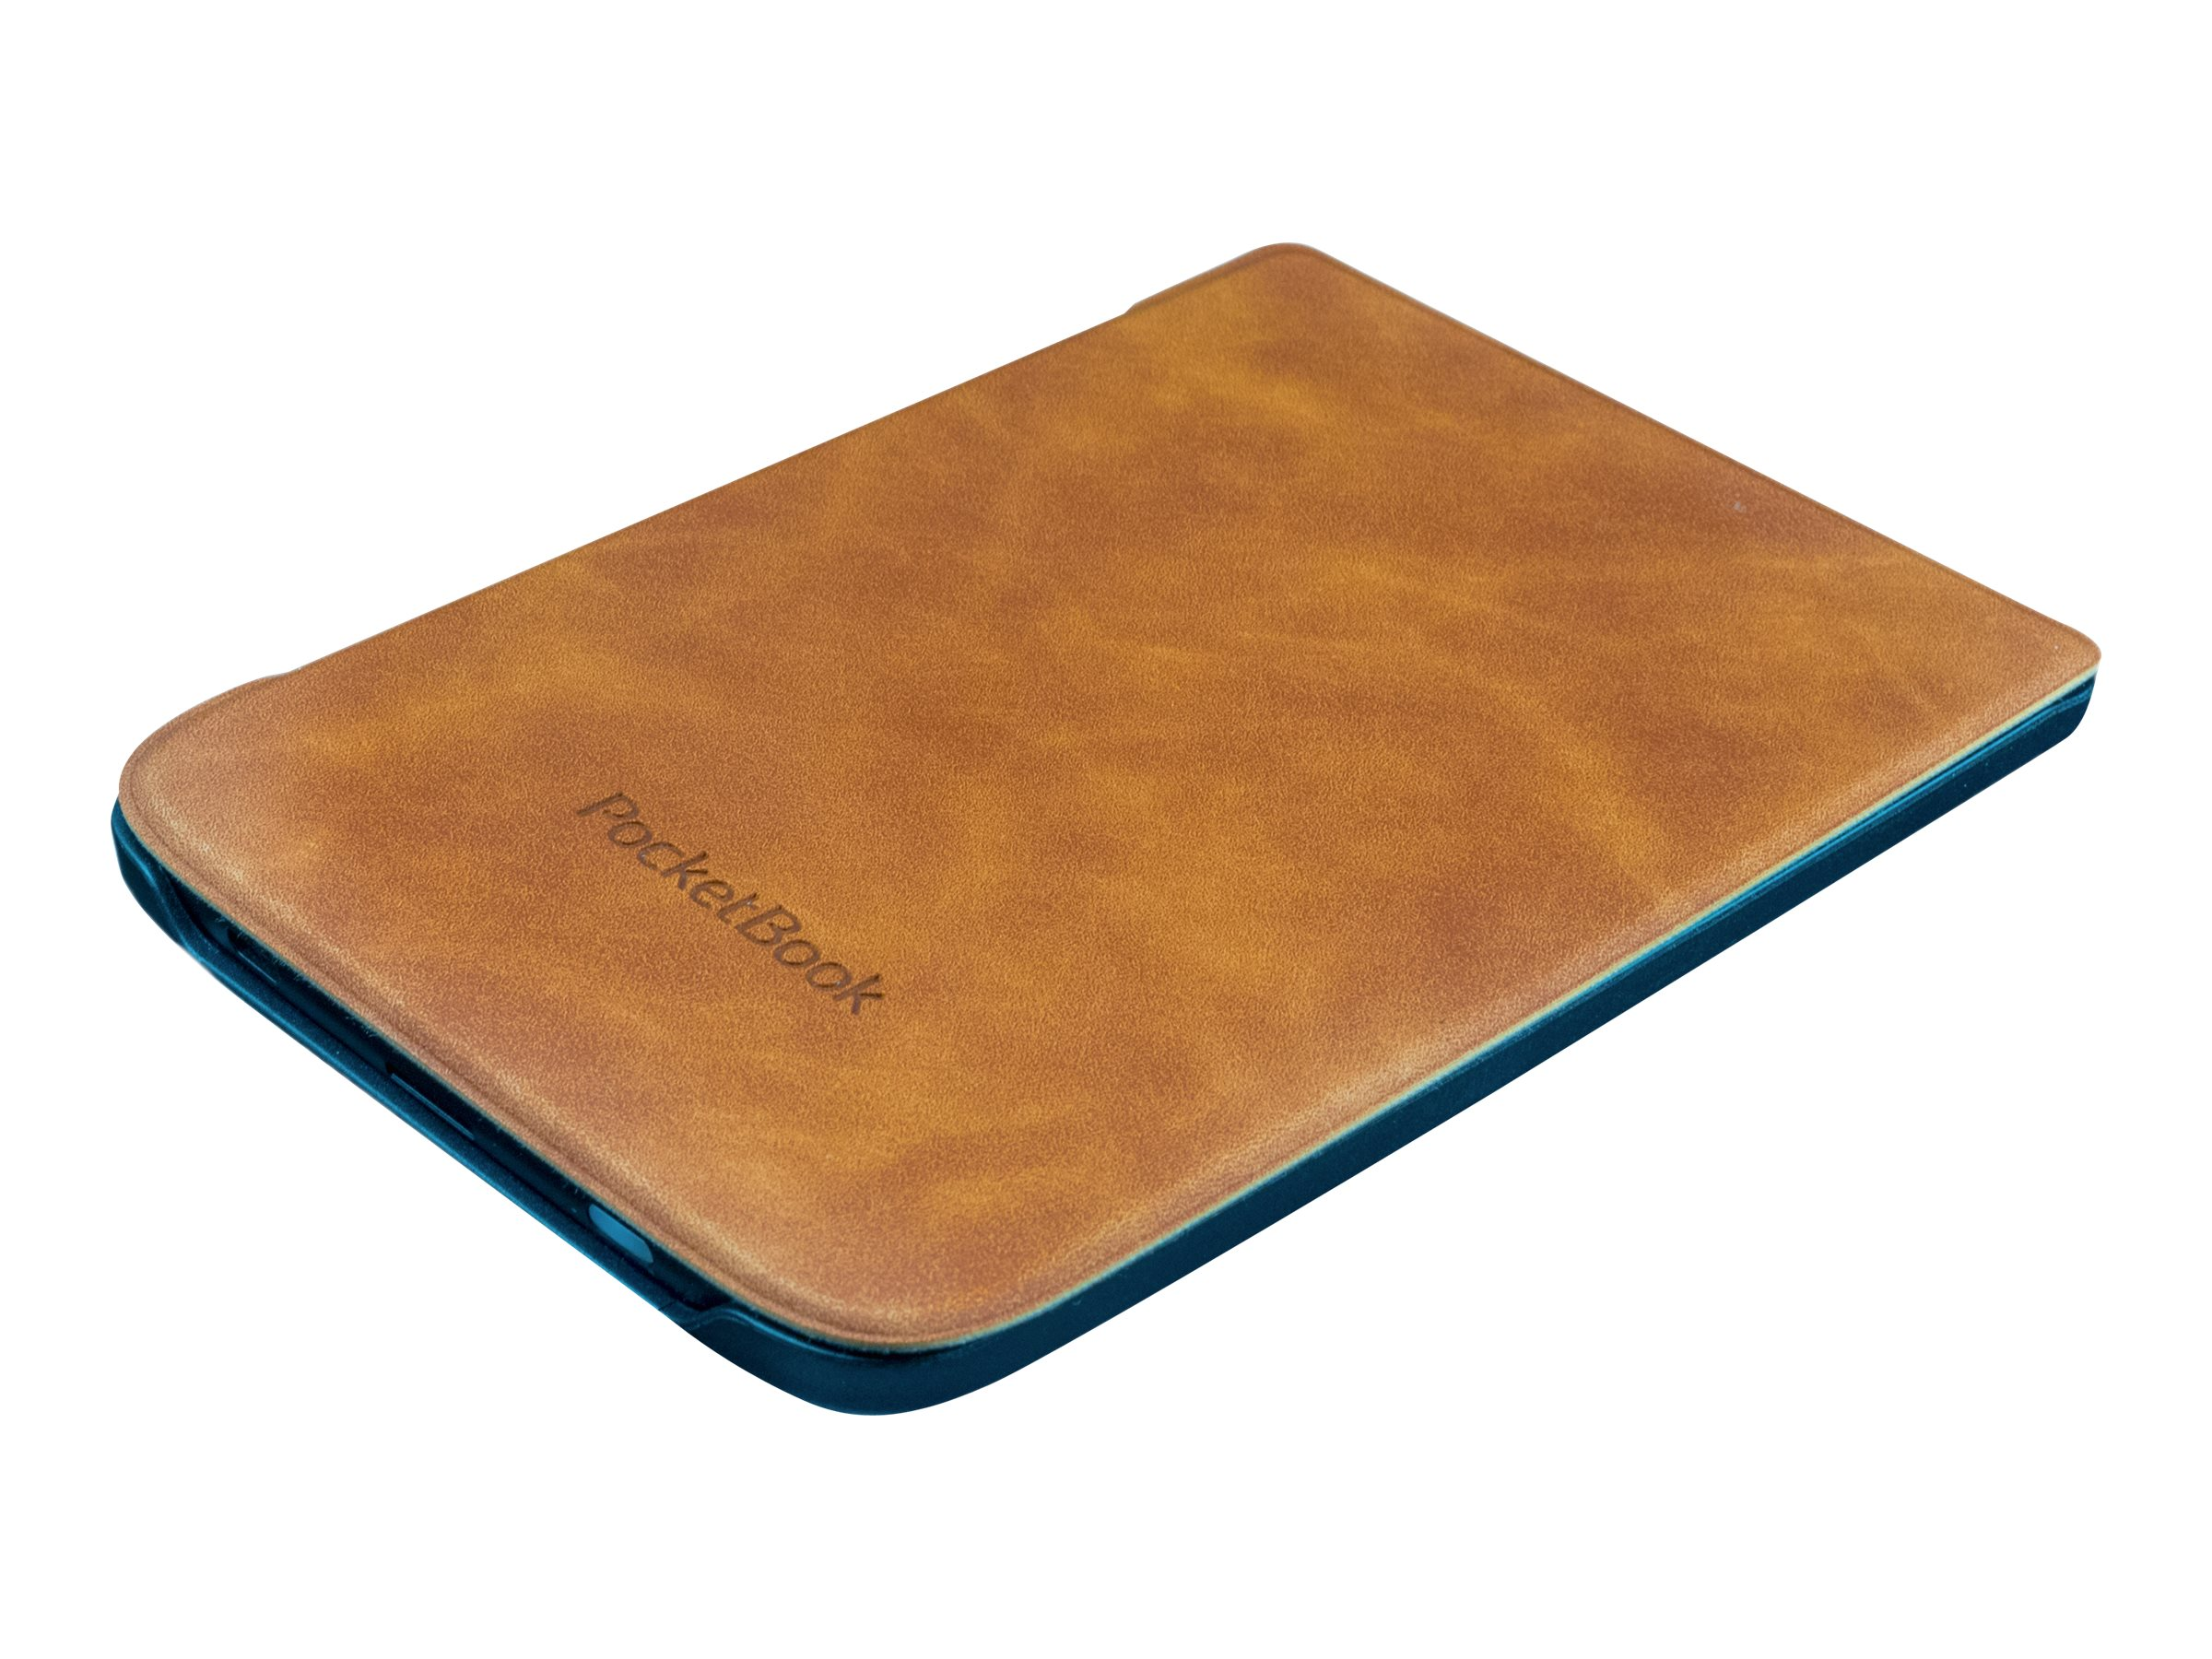 PocketBook Shell series - Flip-Hülle für eBook-Reader - Kunststoff, Polyurethan, Microfiber - für PocketBook Basic Lux 2, Touch